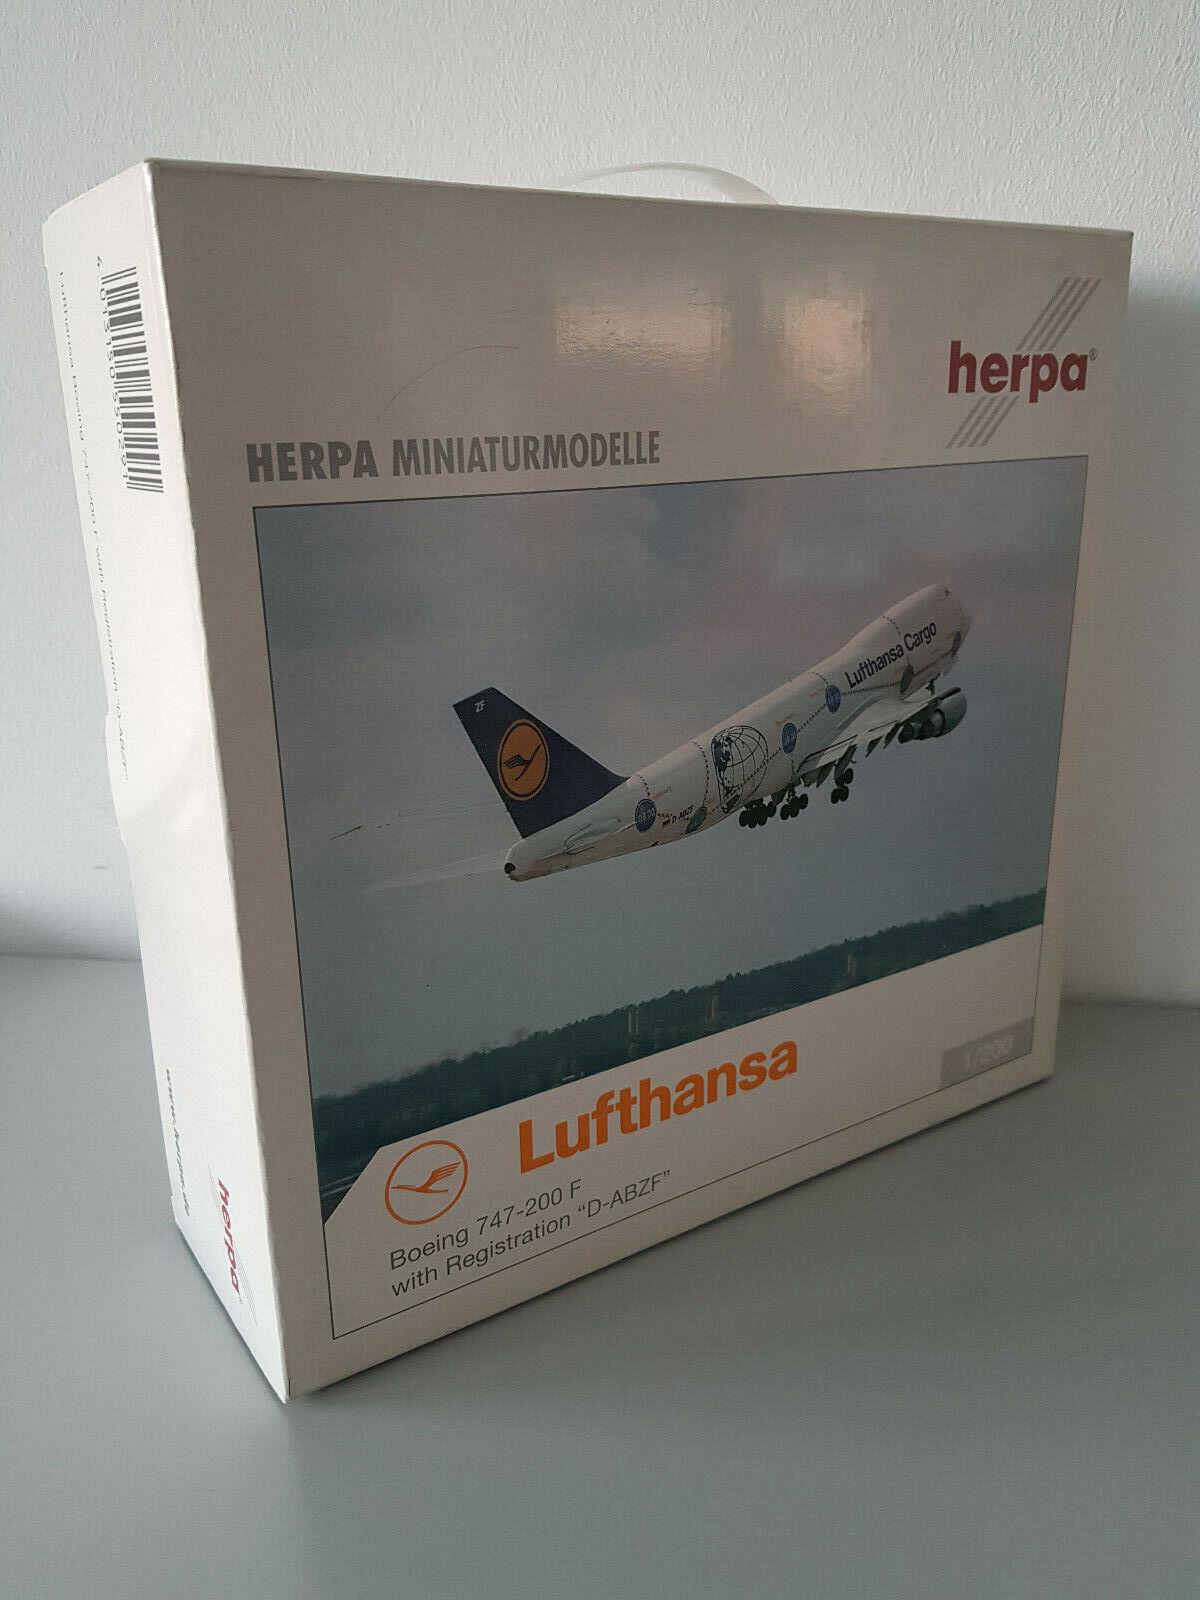 1 200 Herpa Wings 550291 Lufthansa Cargo Boeing 747-200 F service Reg. D-Abzf NEUF